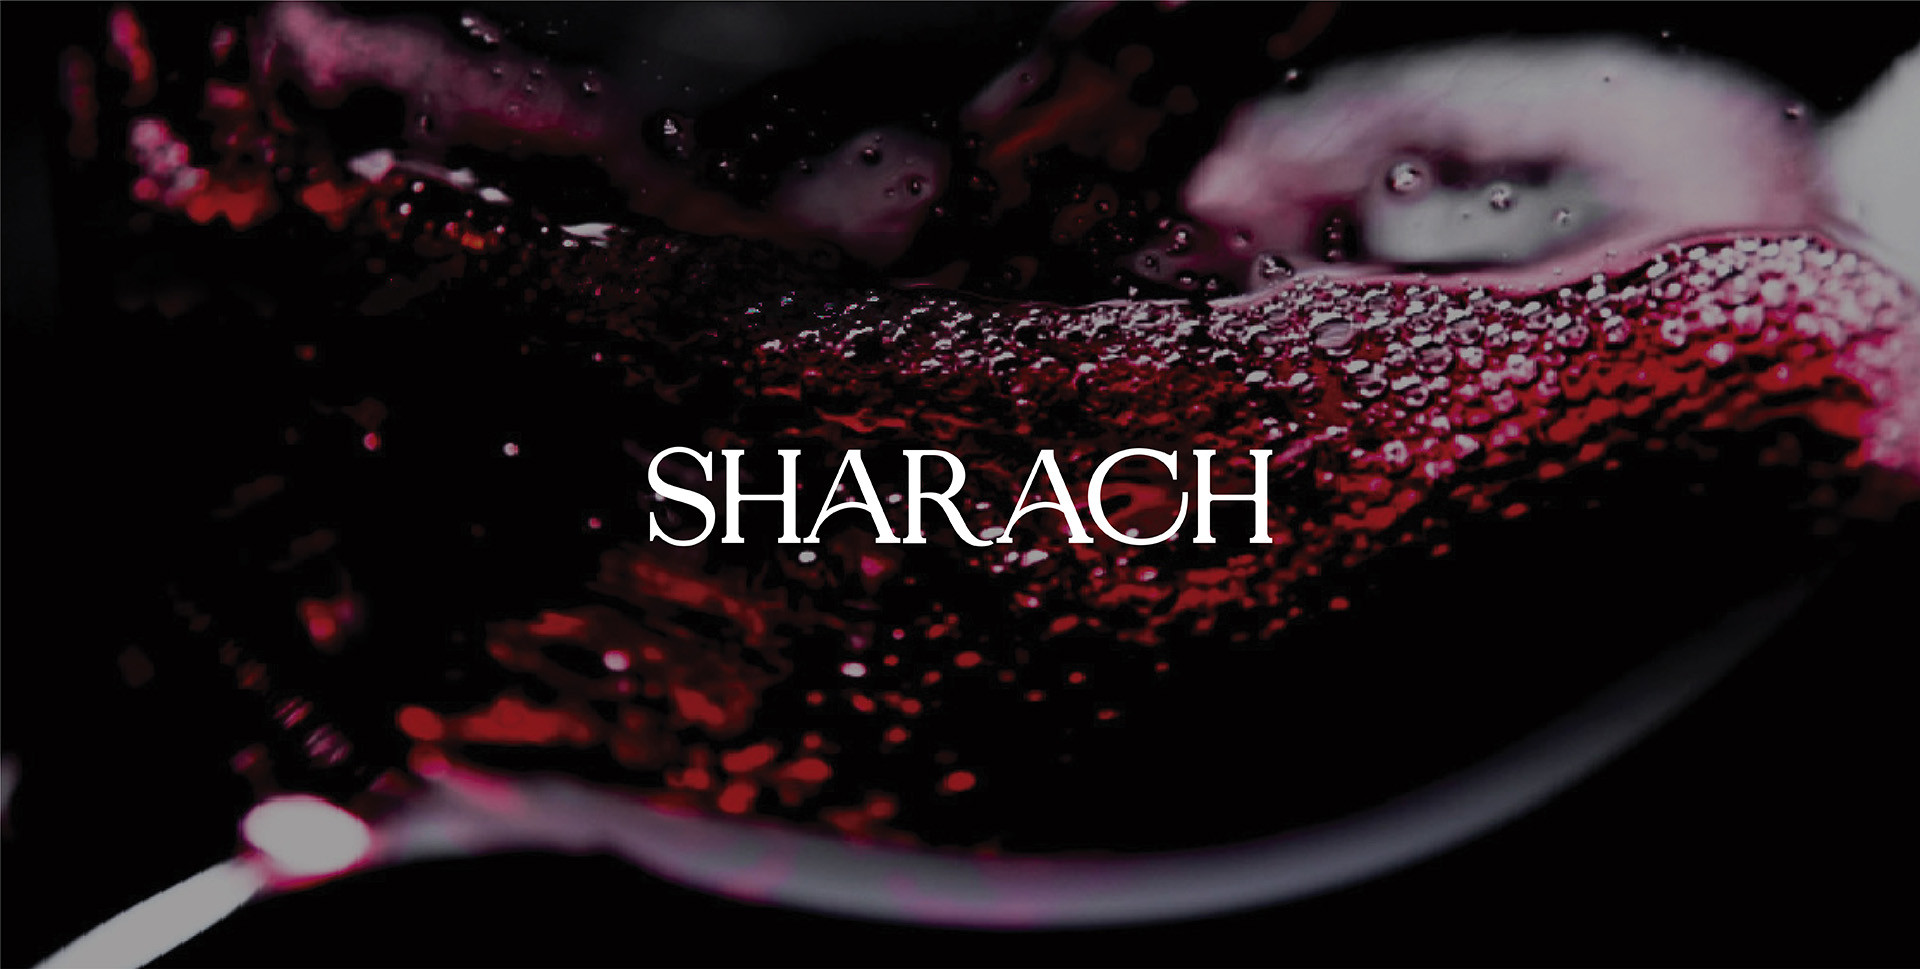 Sharach